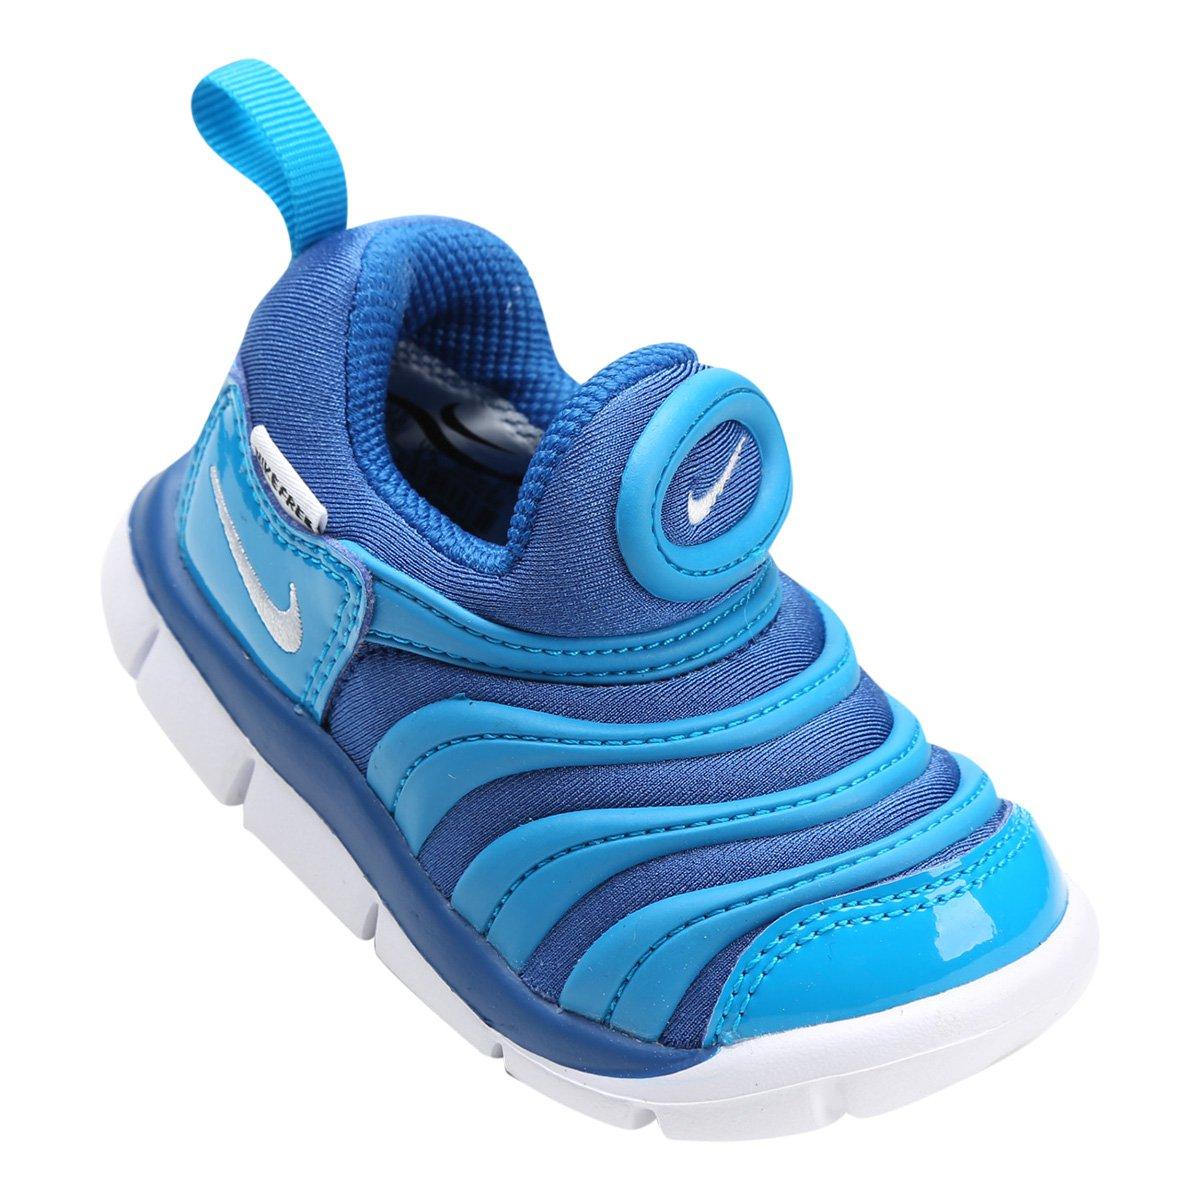 best website 52999 b00eb Tênis Infantil Nike Dynamo Free TD Masculino - Compre Agora